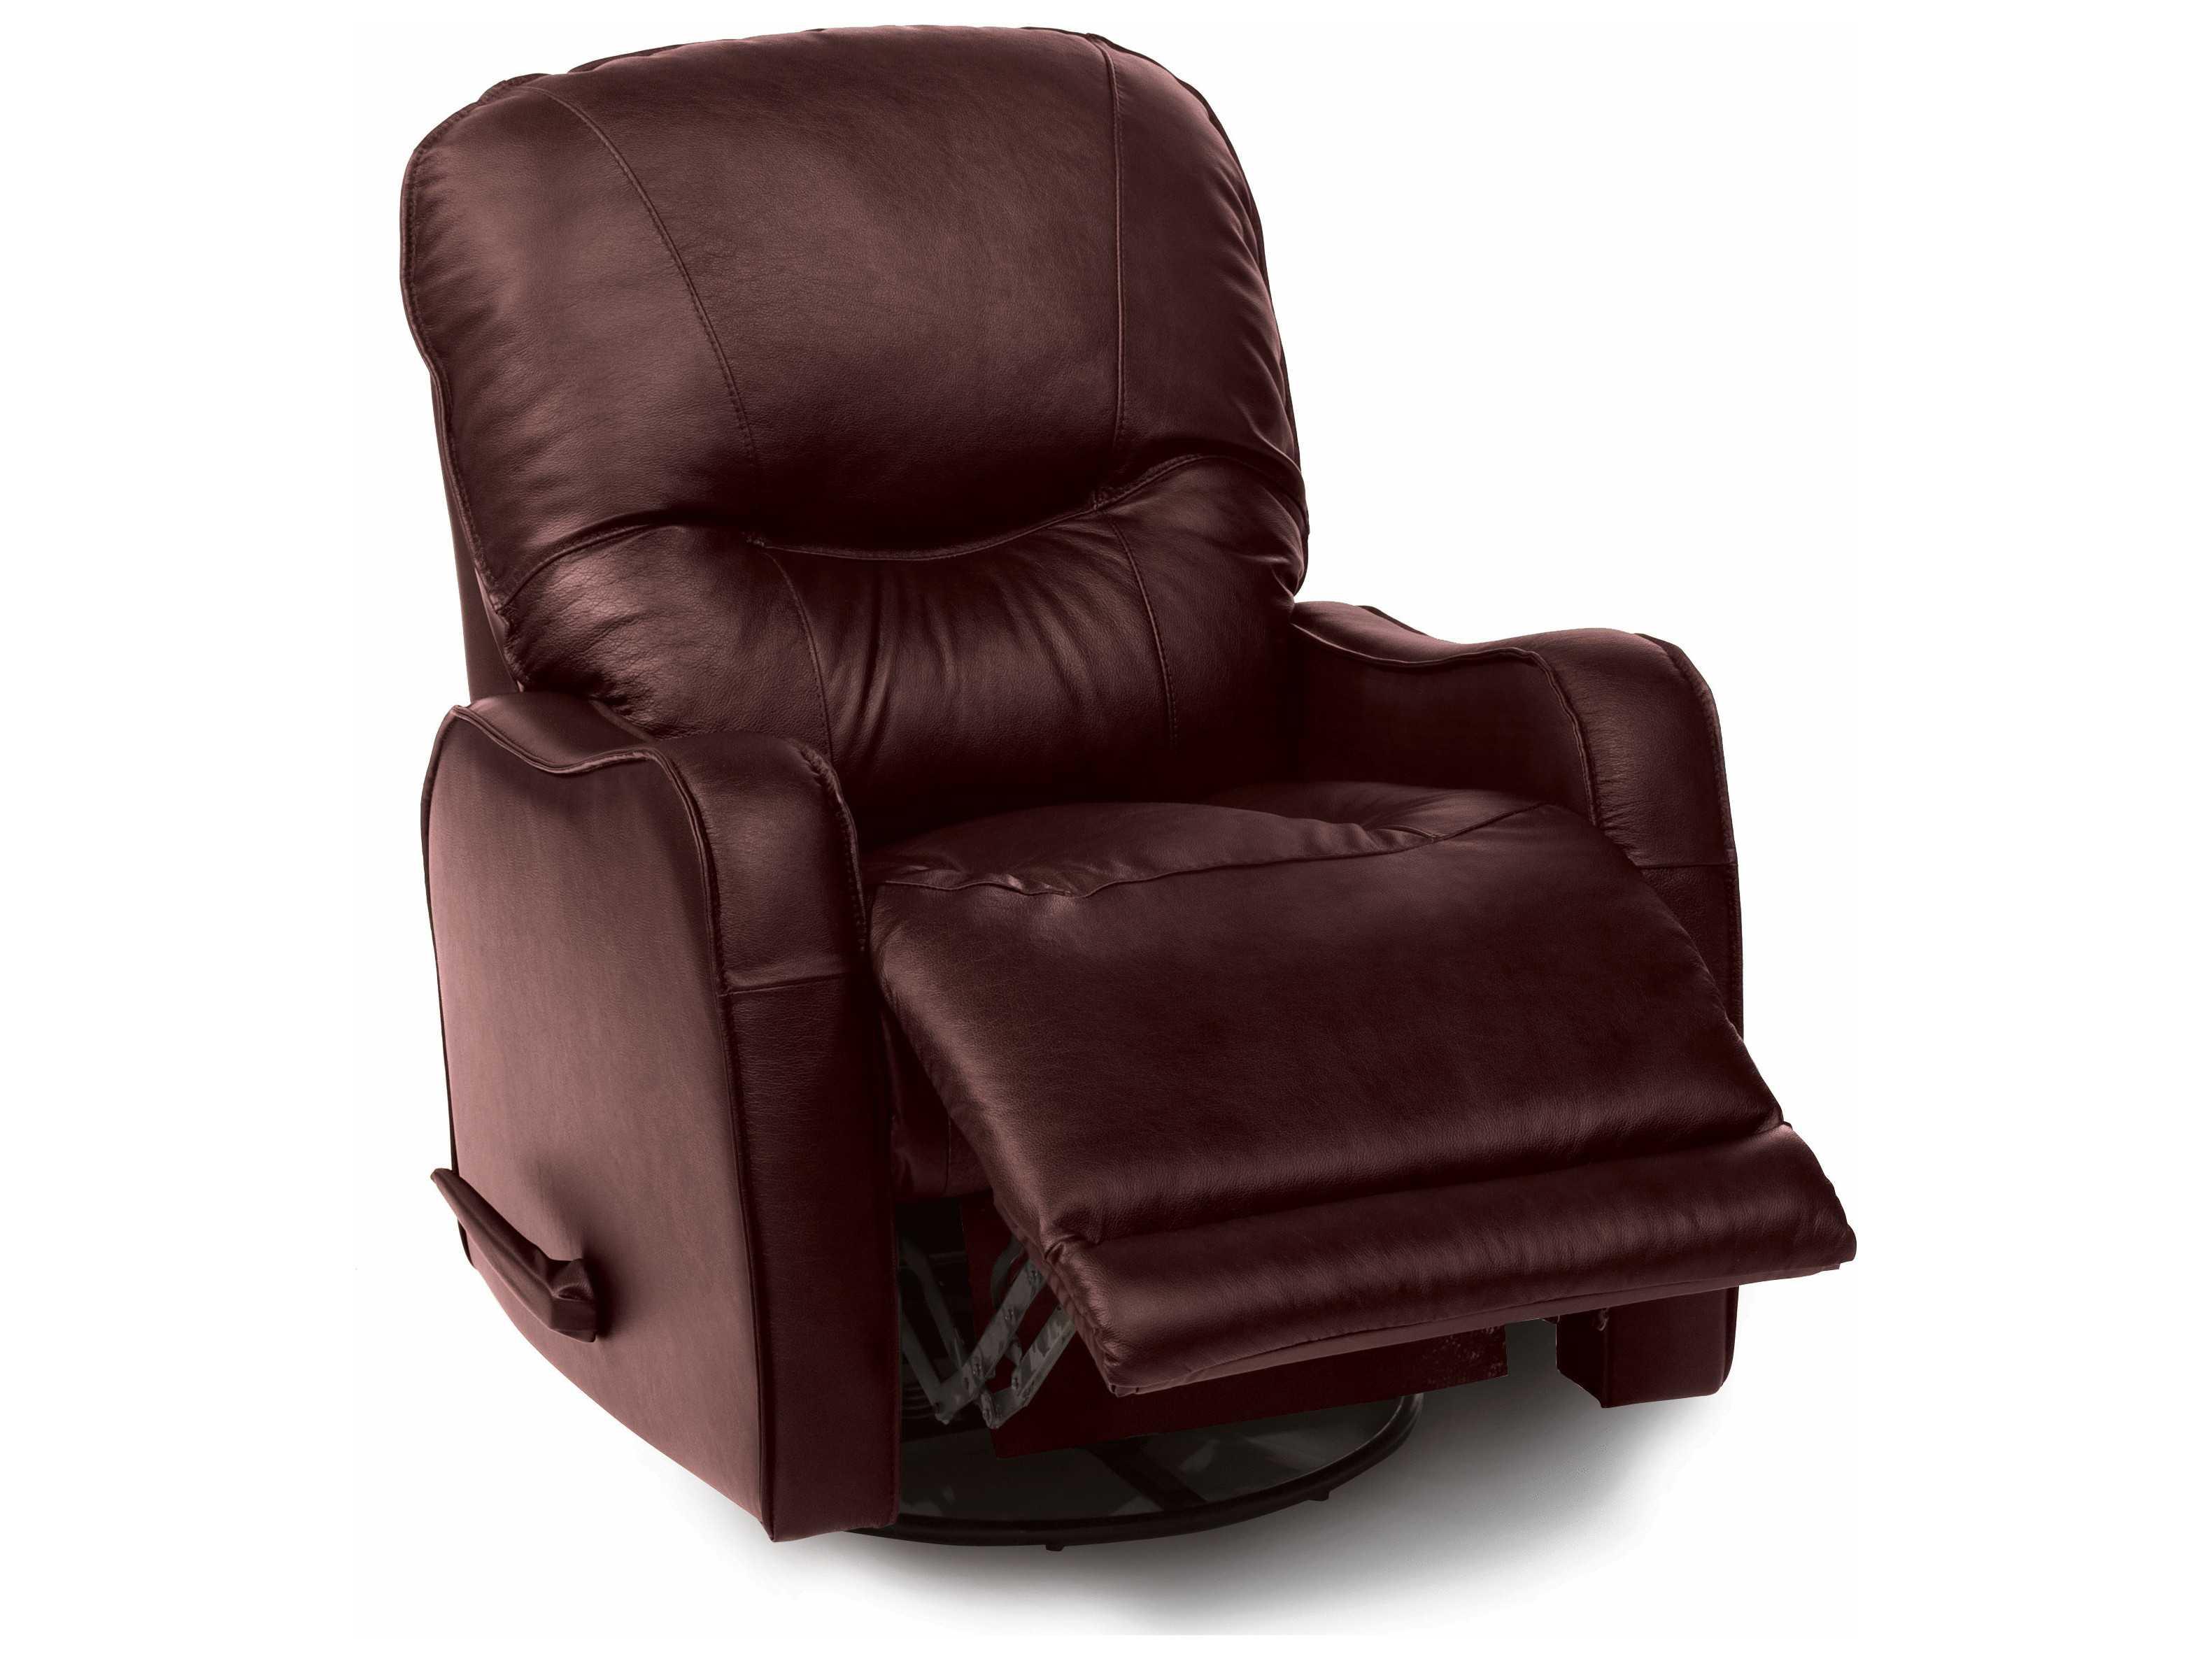 Palliser Yates Swivel Rocker Recliner Chair Pl4301233